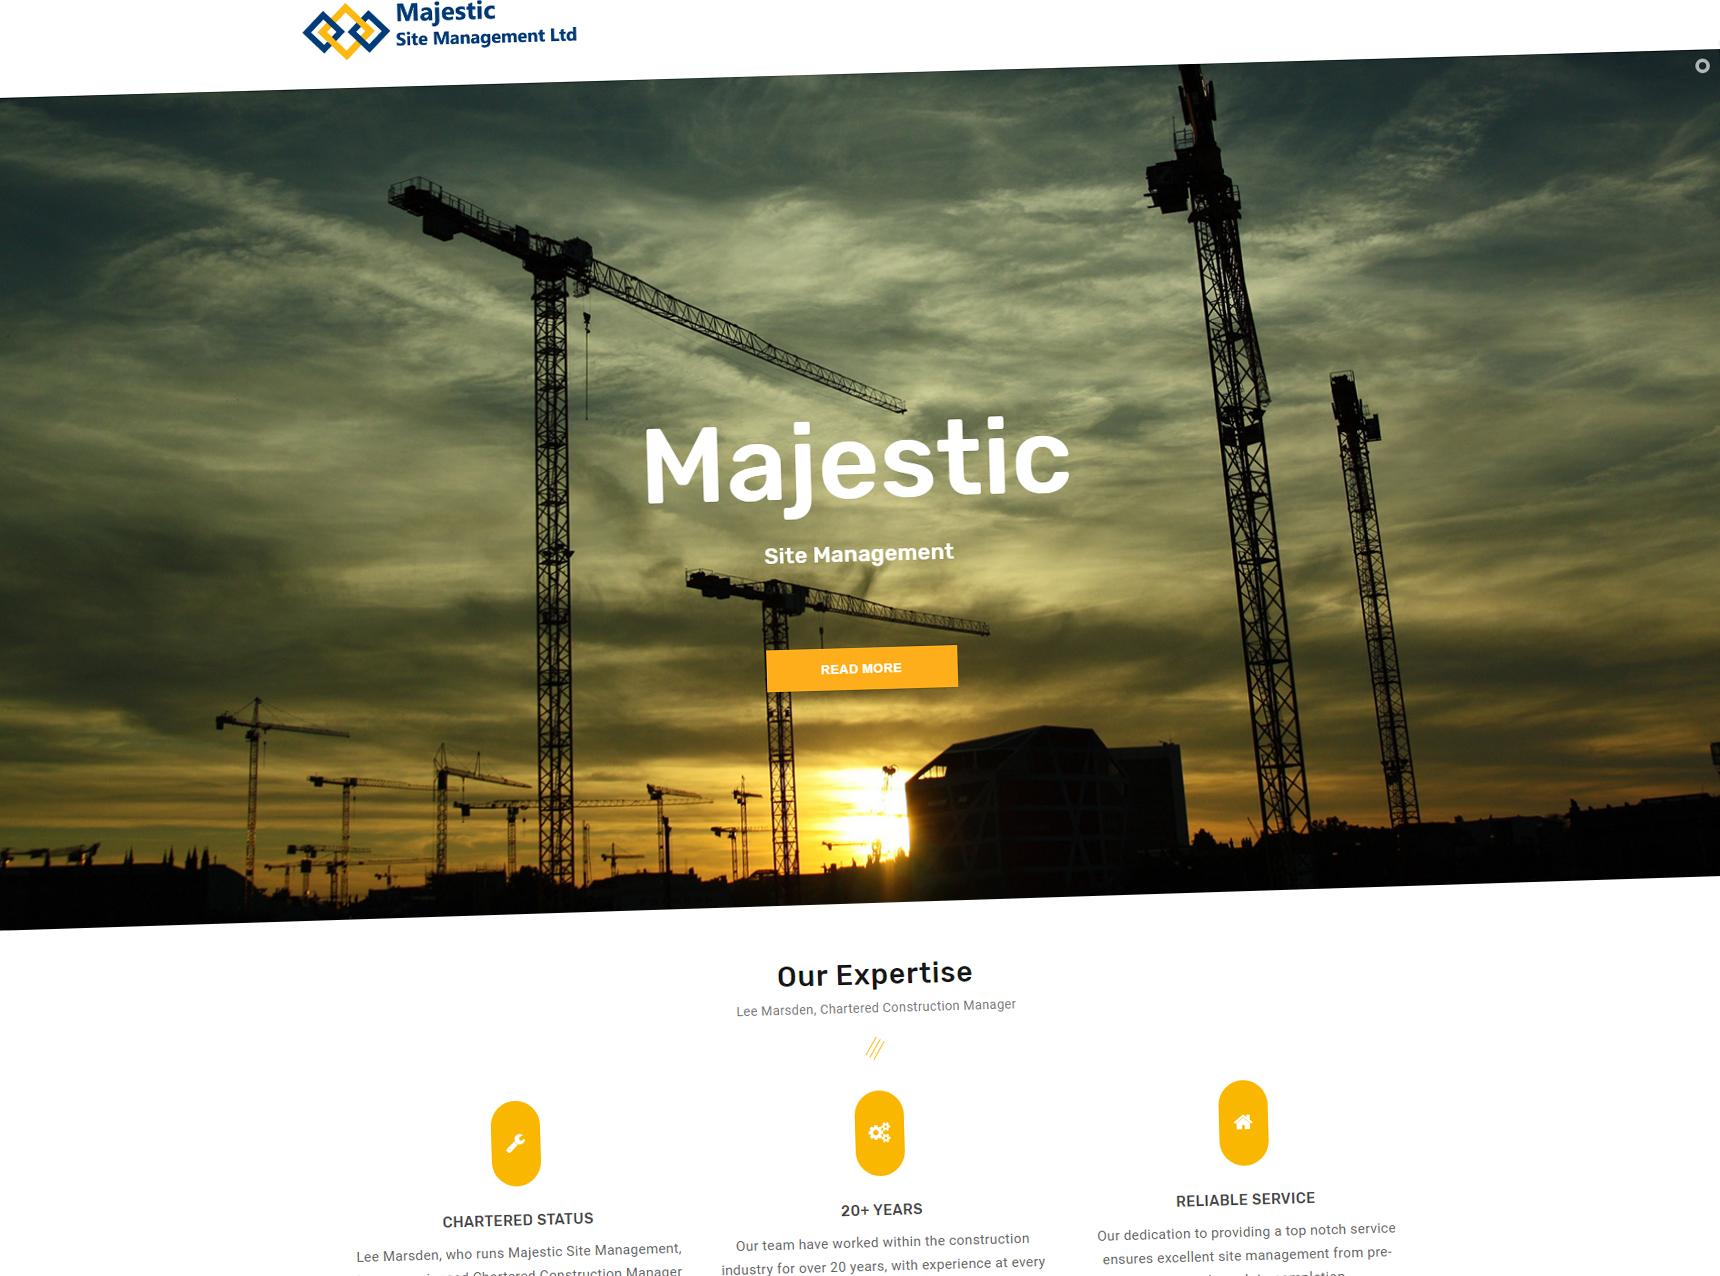 Majestic Site Management Website